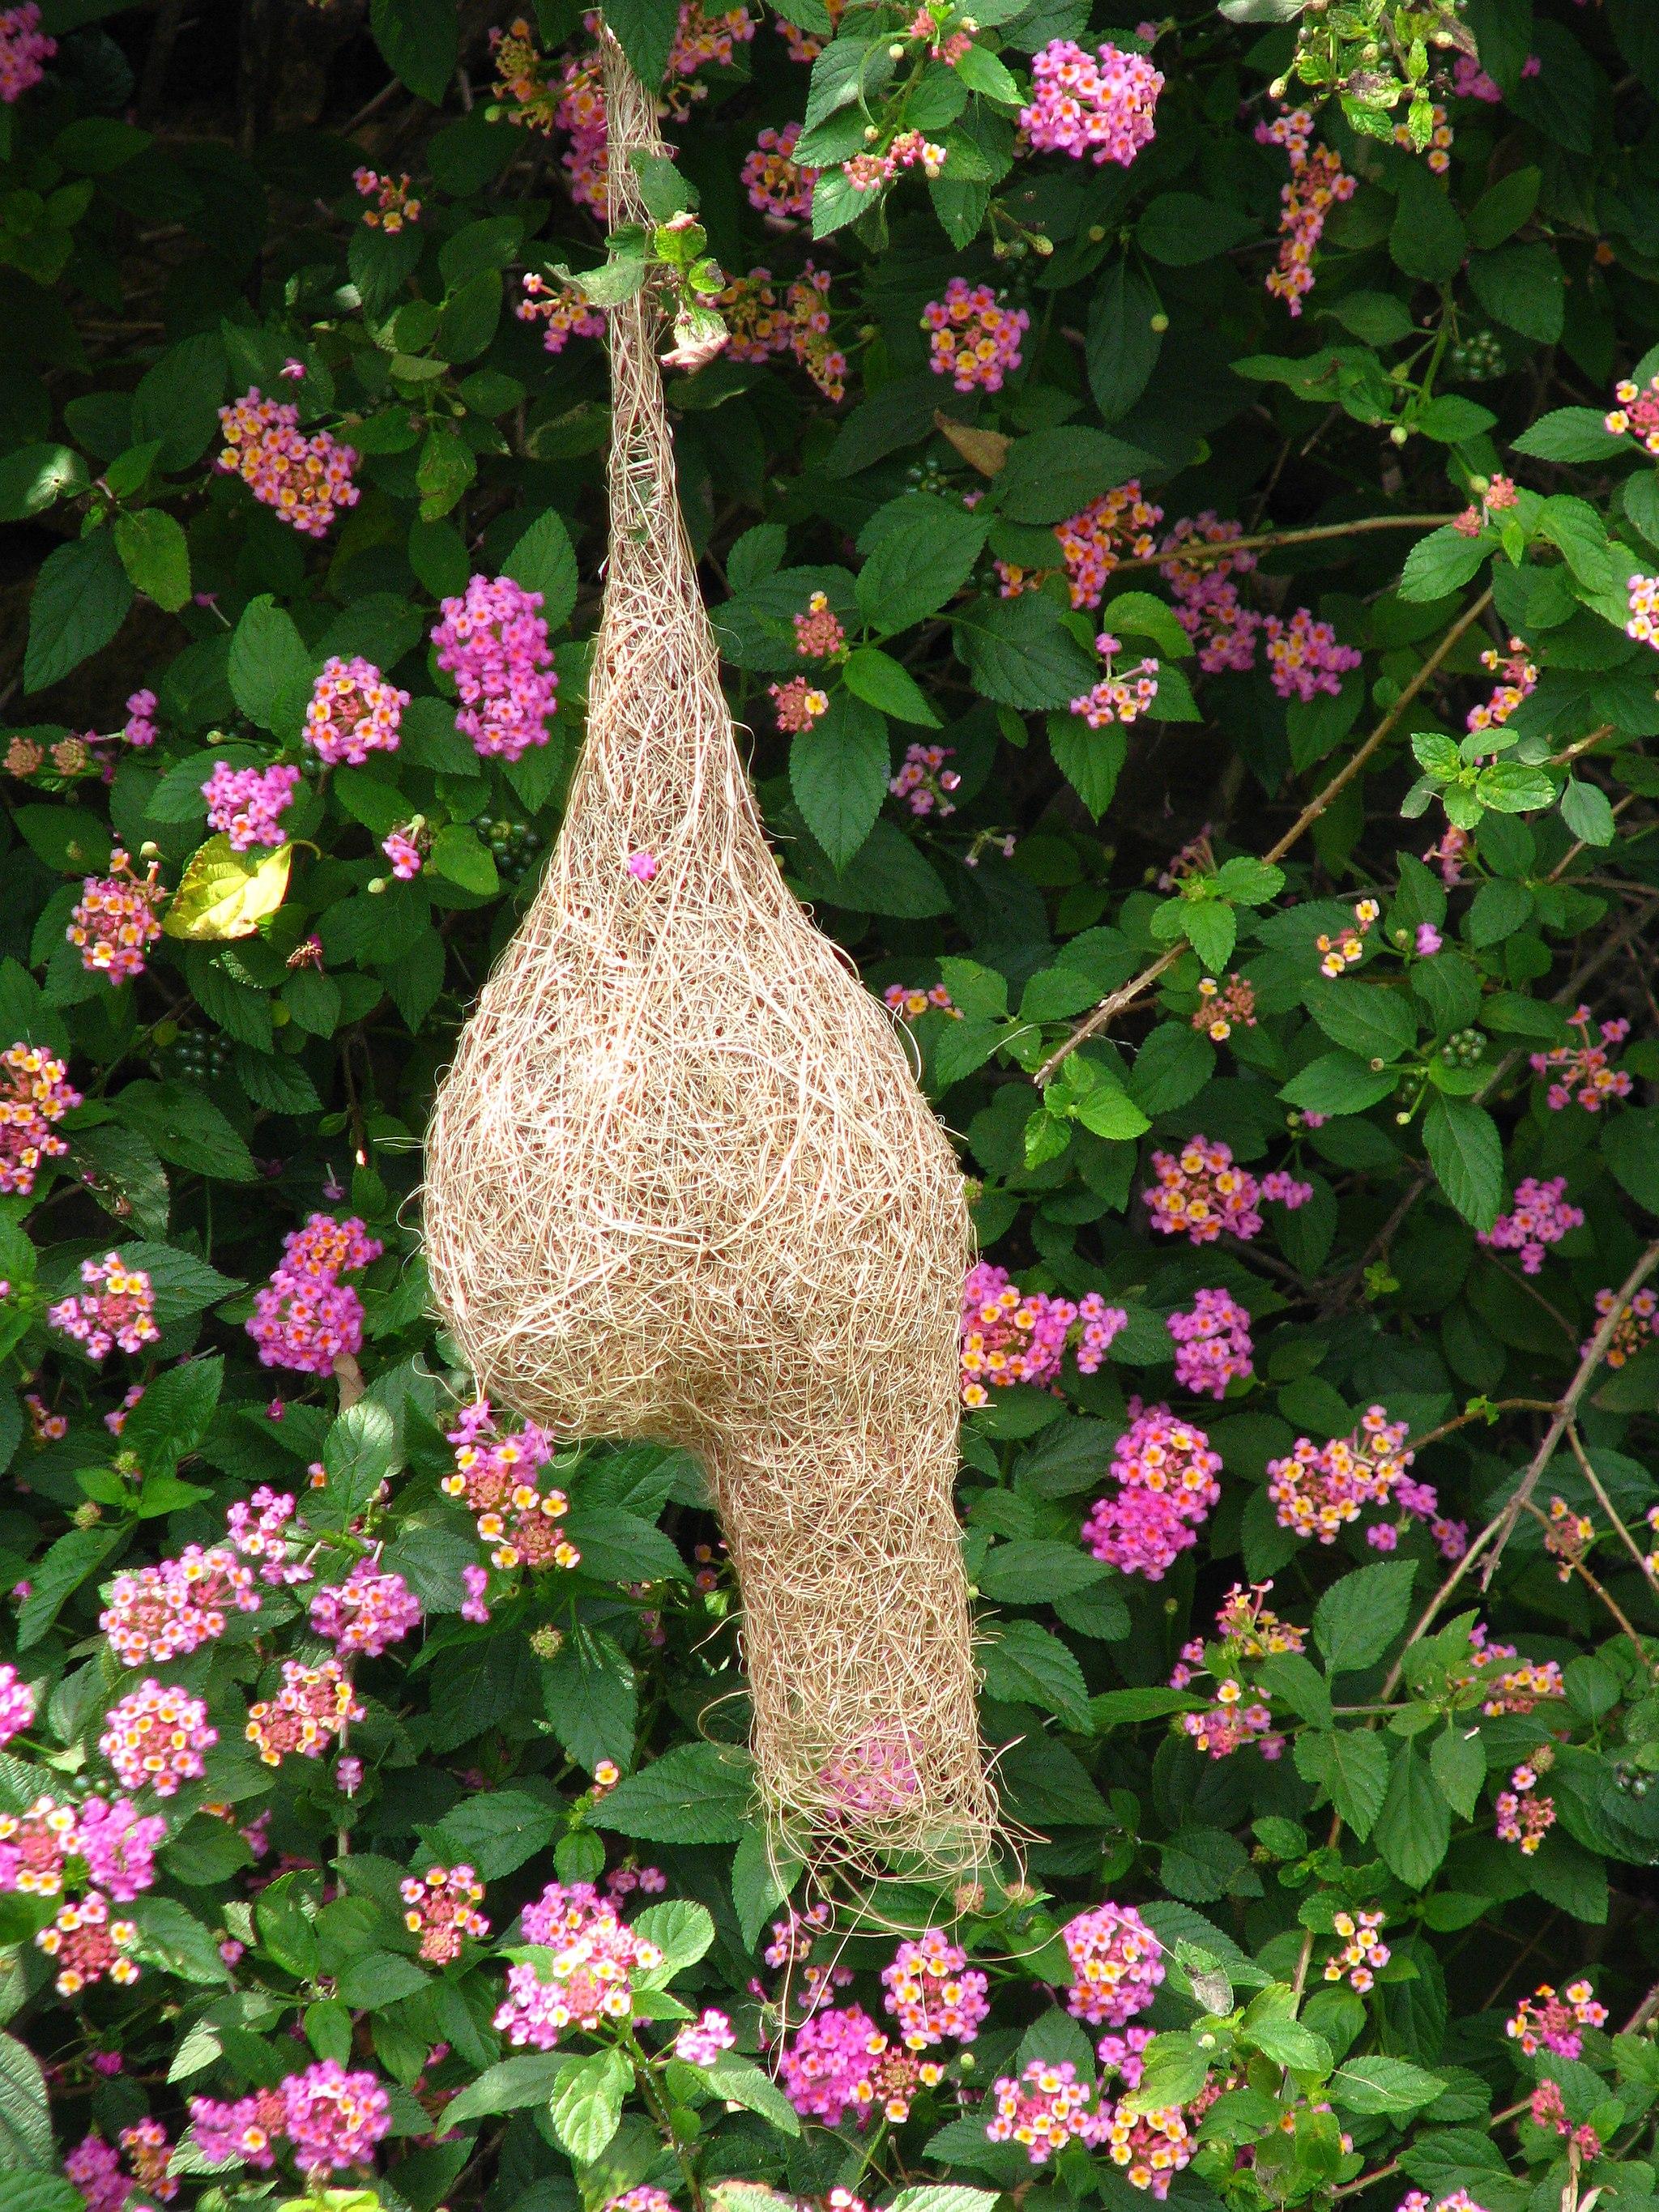 A Bird's nest at Yelagiri, India